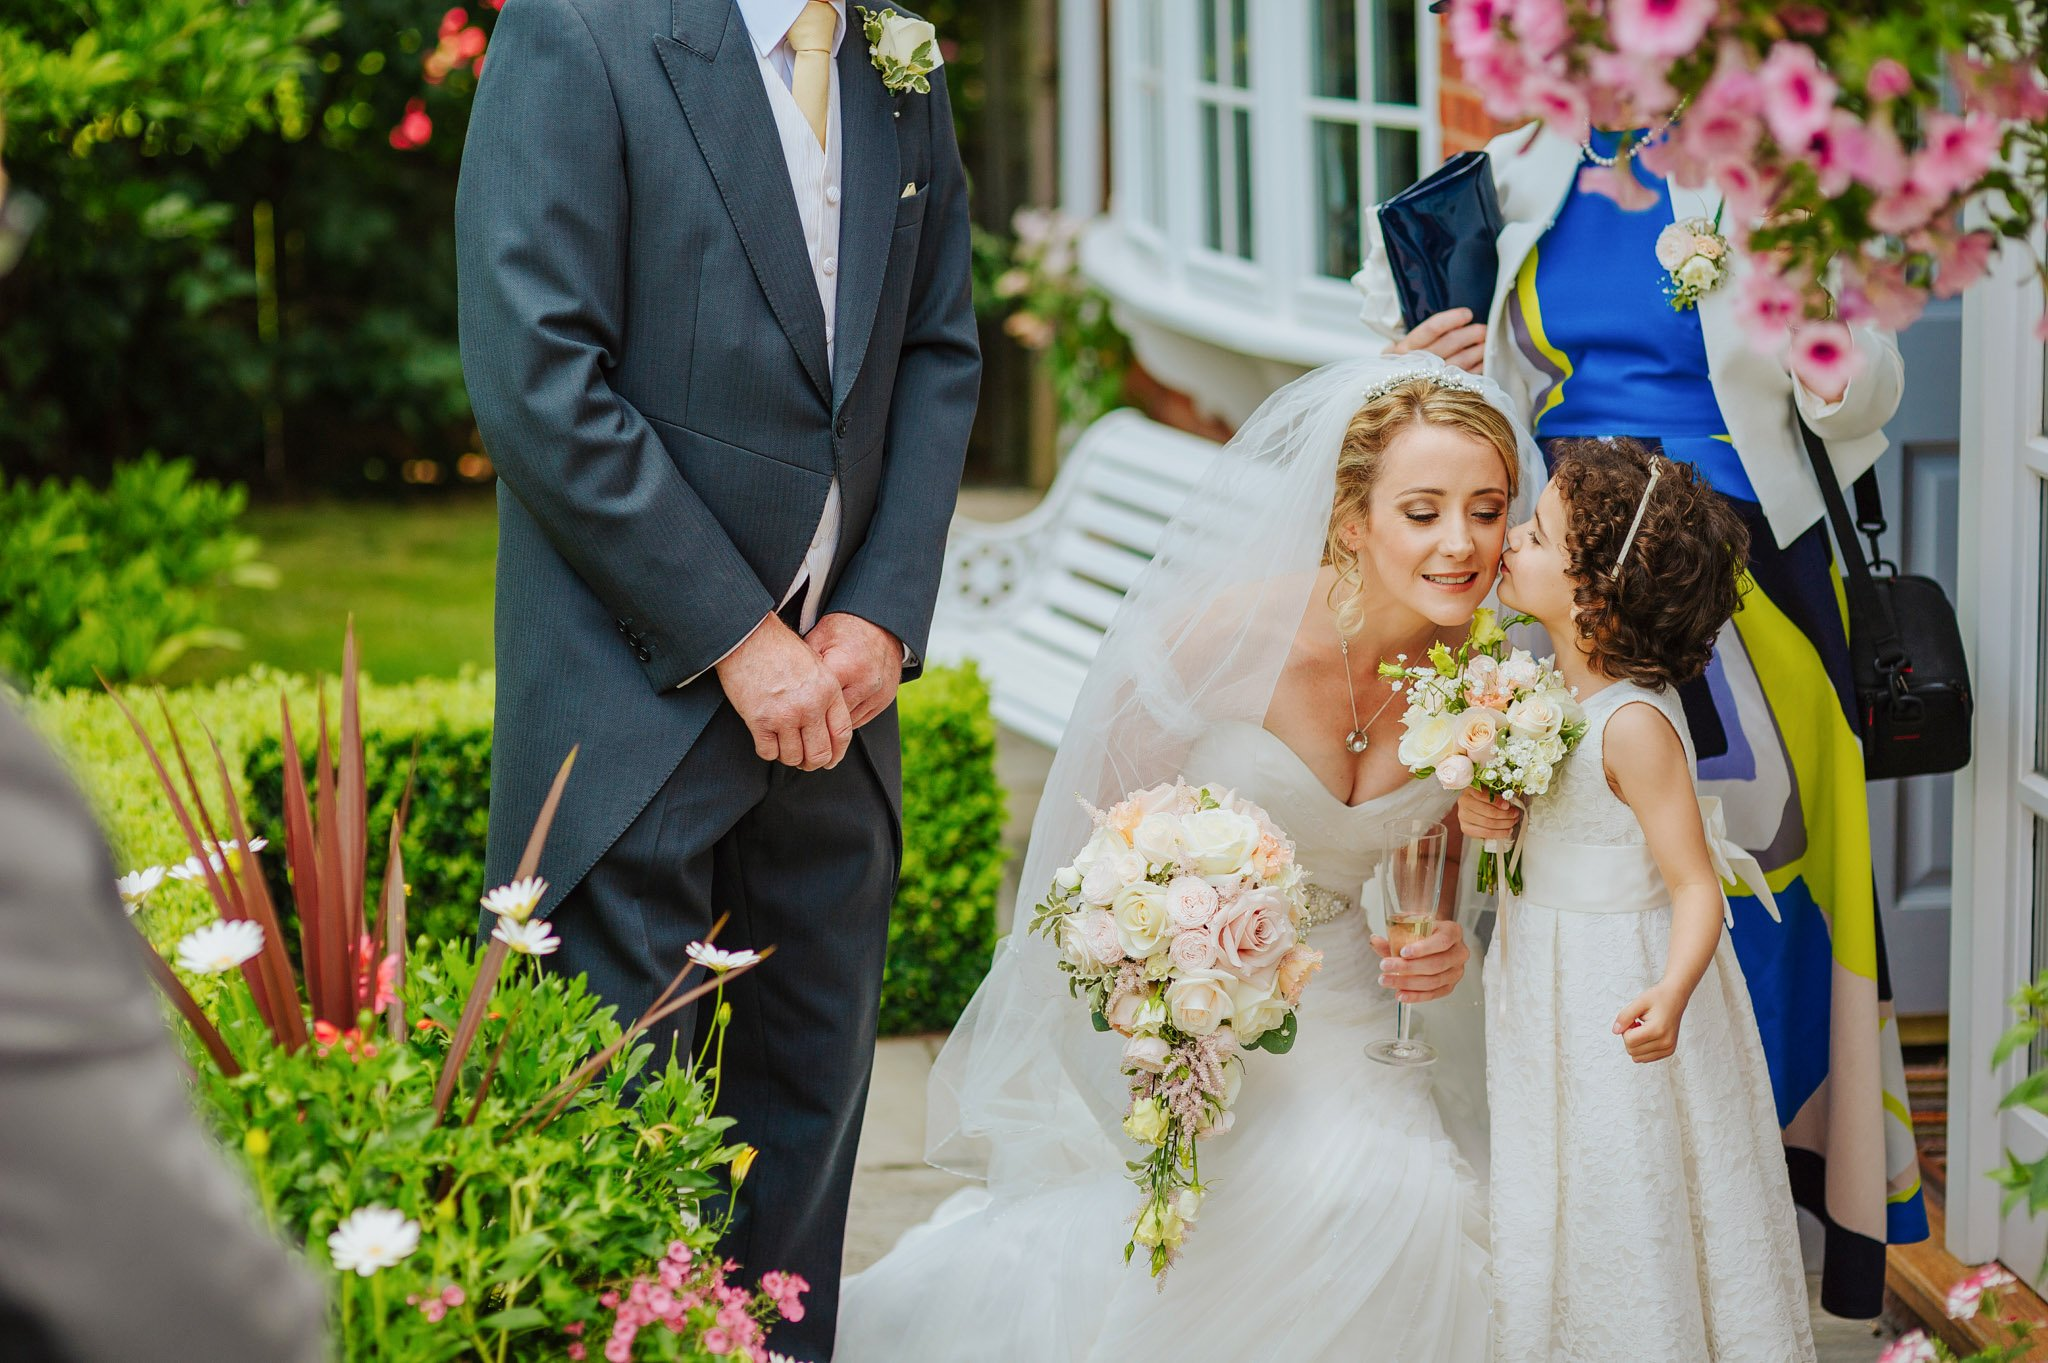 Georgina + Mike - Wedding photography in Malvern, Worcestershire 10